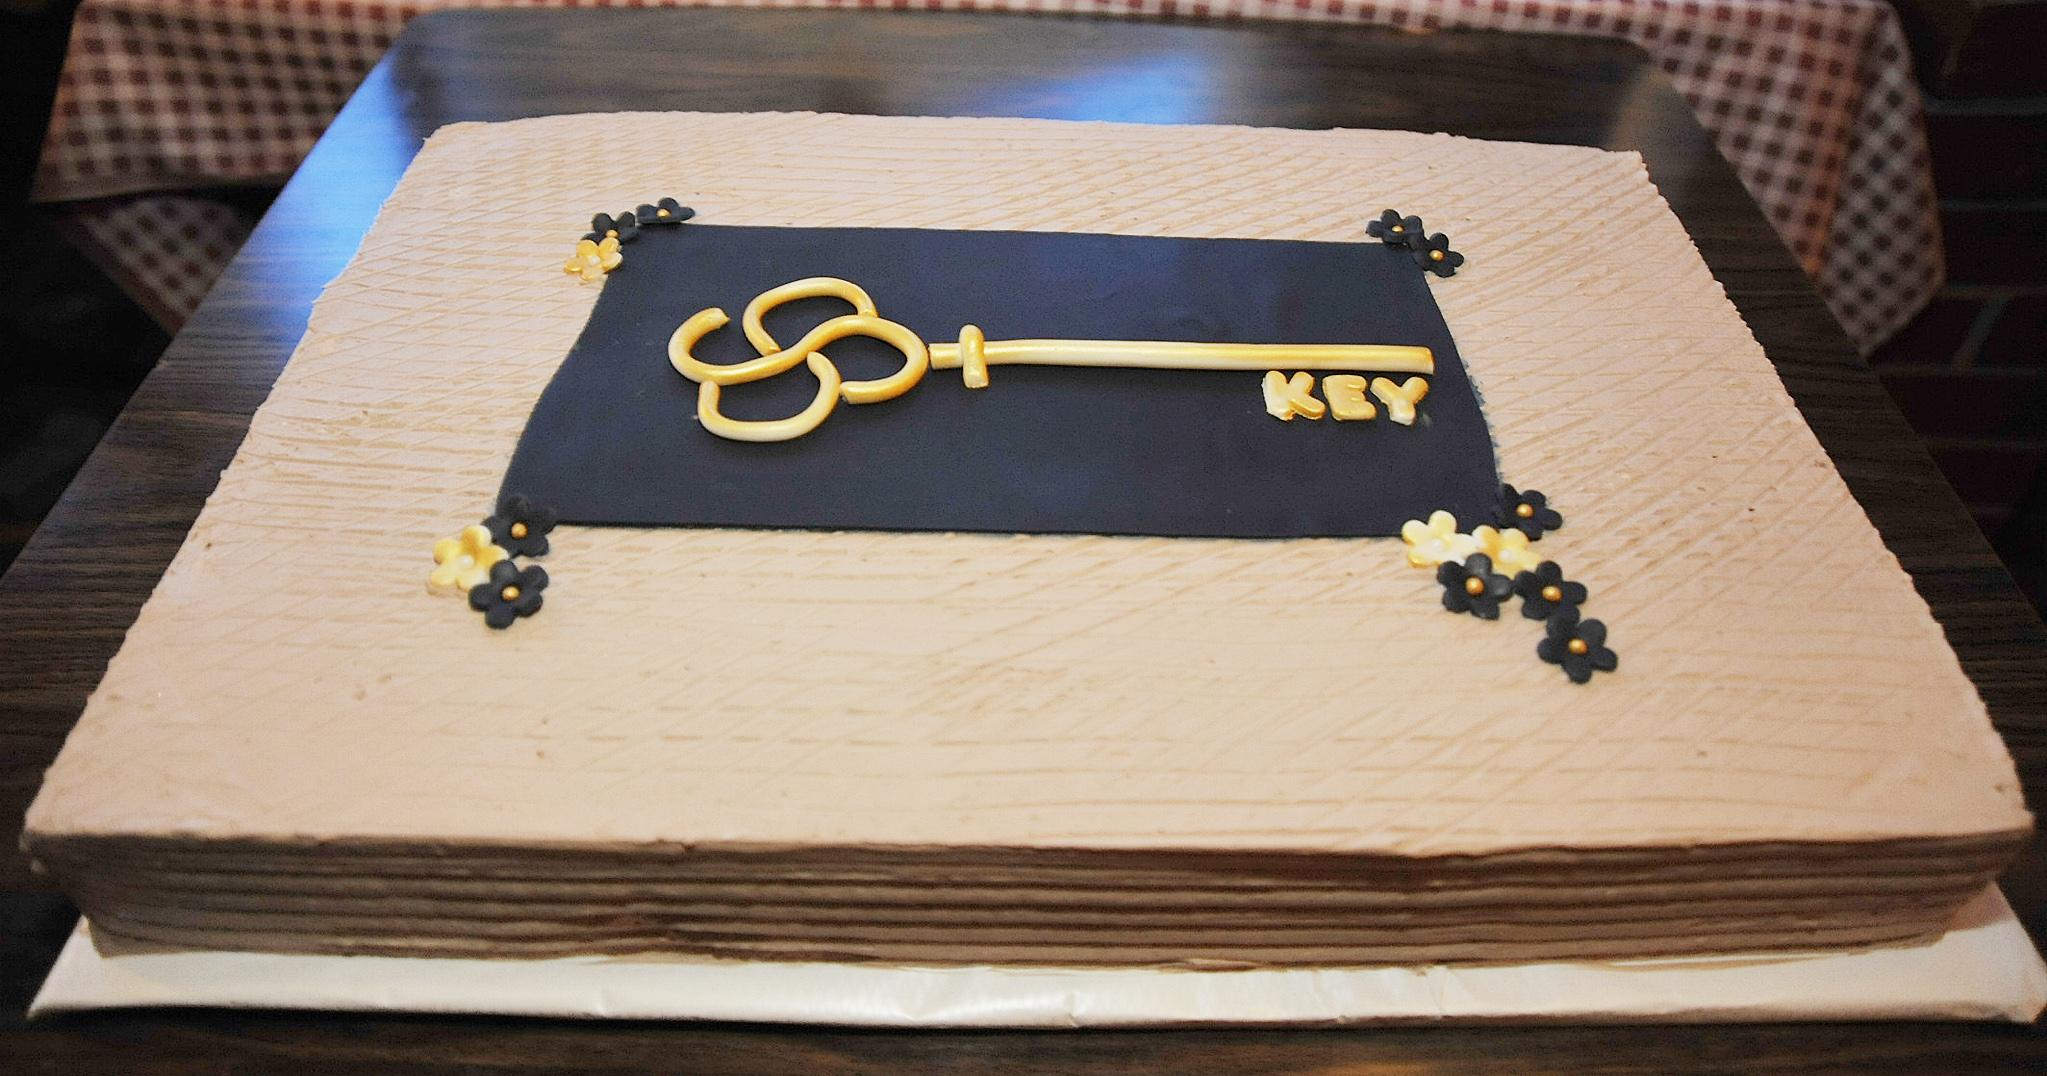 Ključ, simbol bivše tvrtke, na torti / Snimio Sergej DRECHSLER